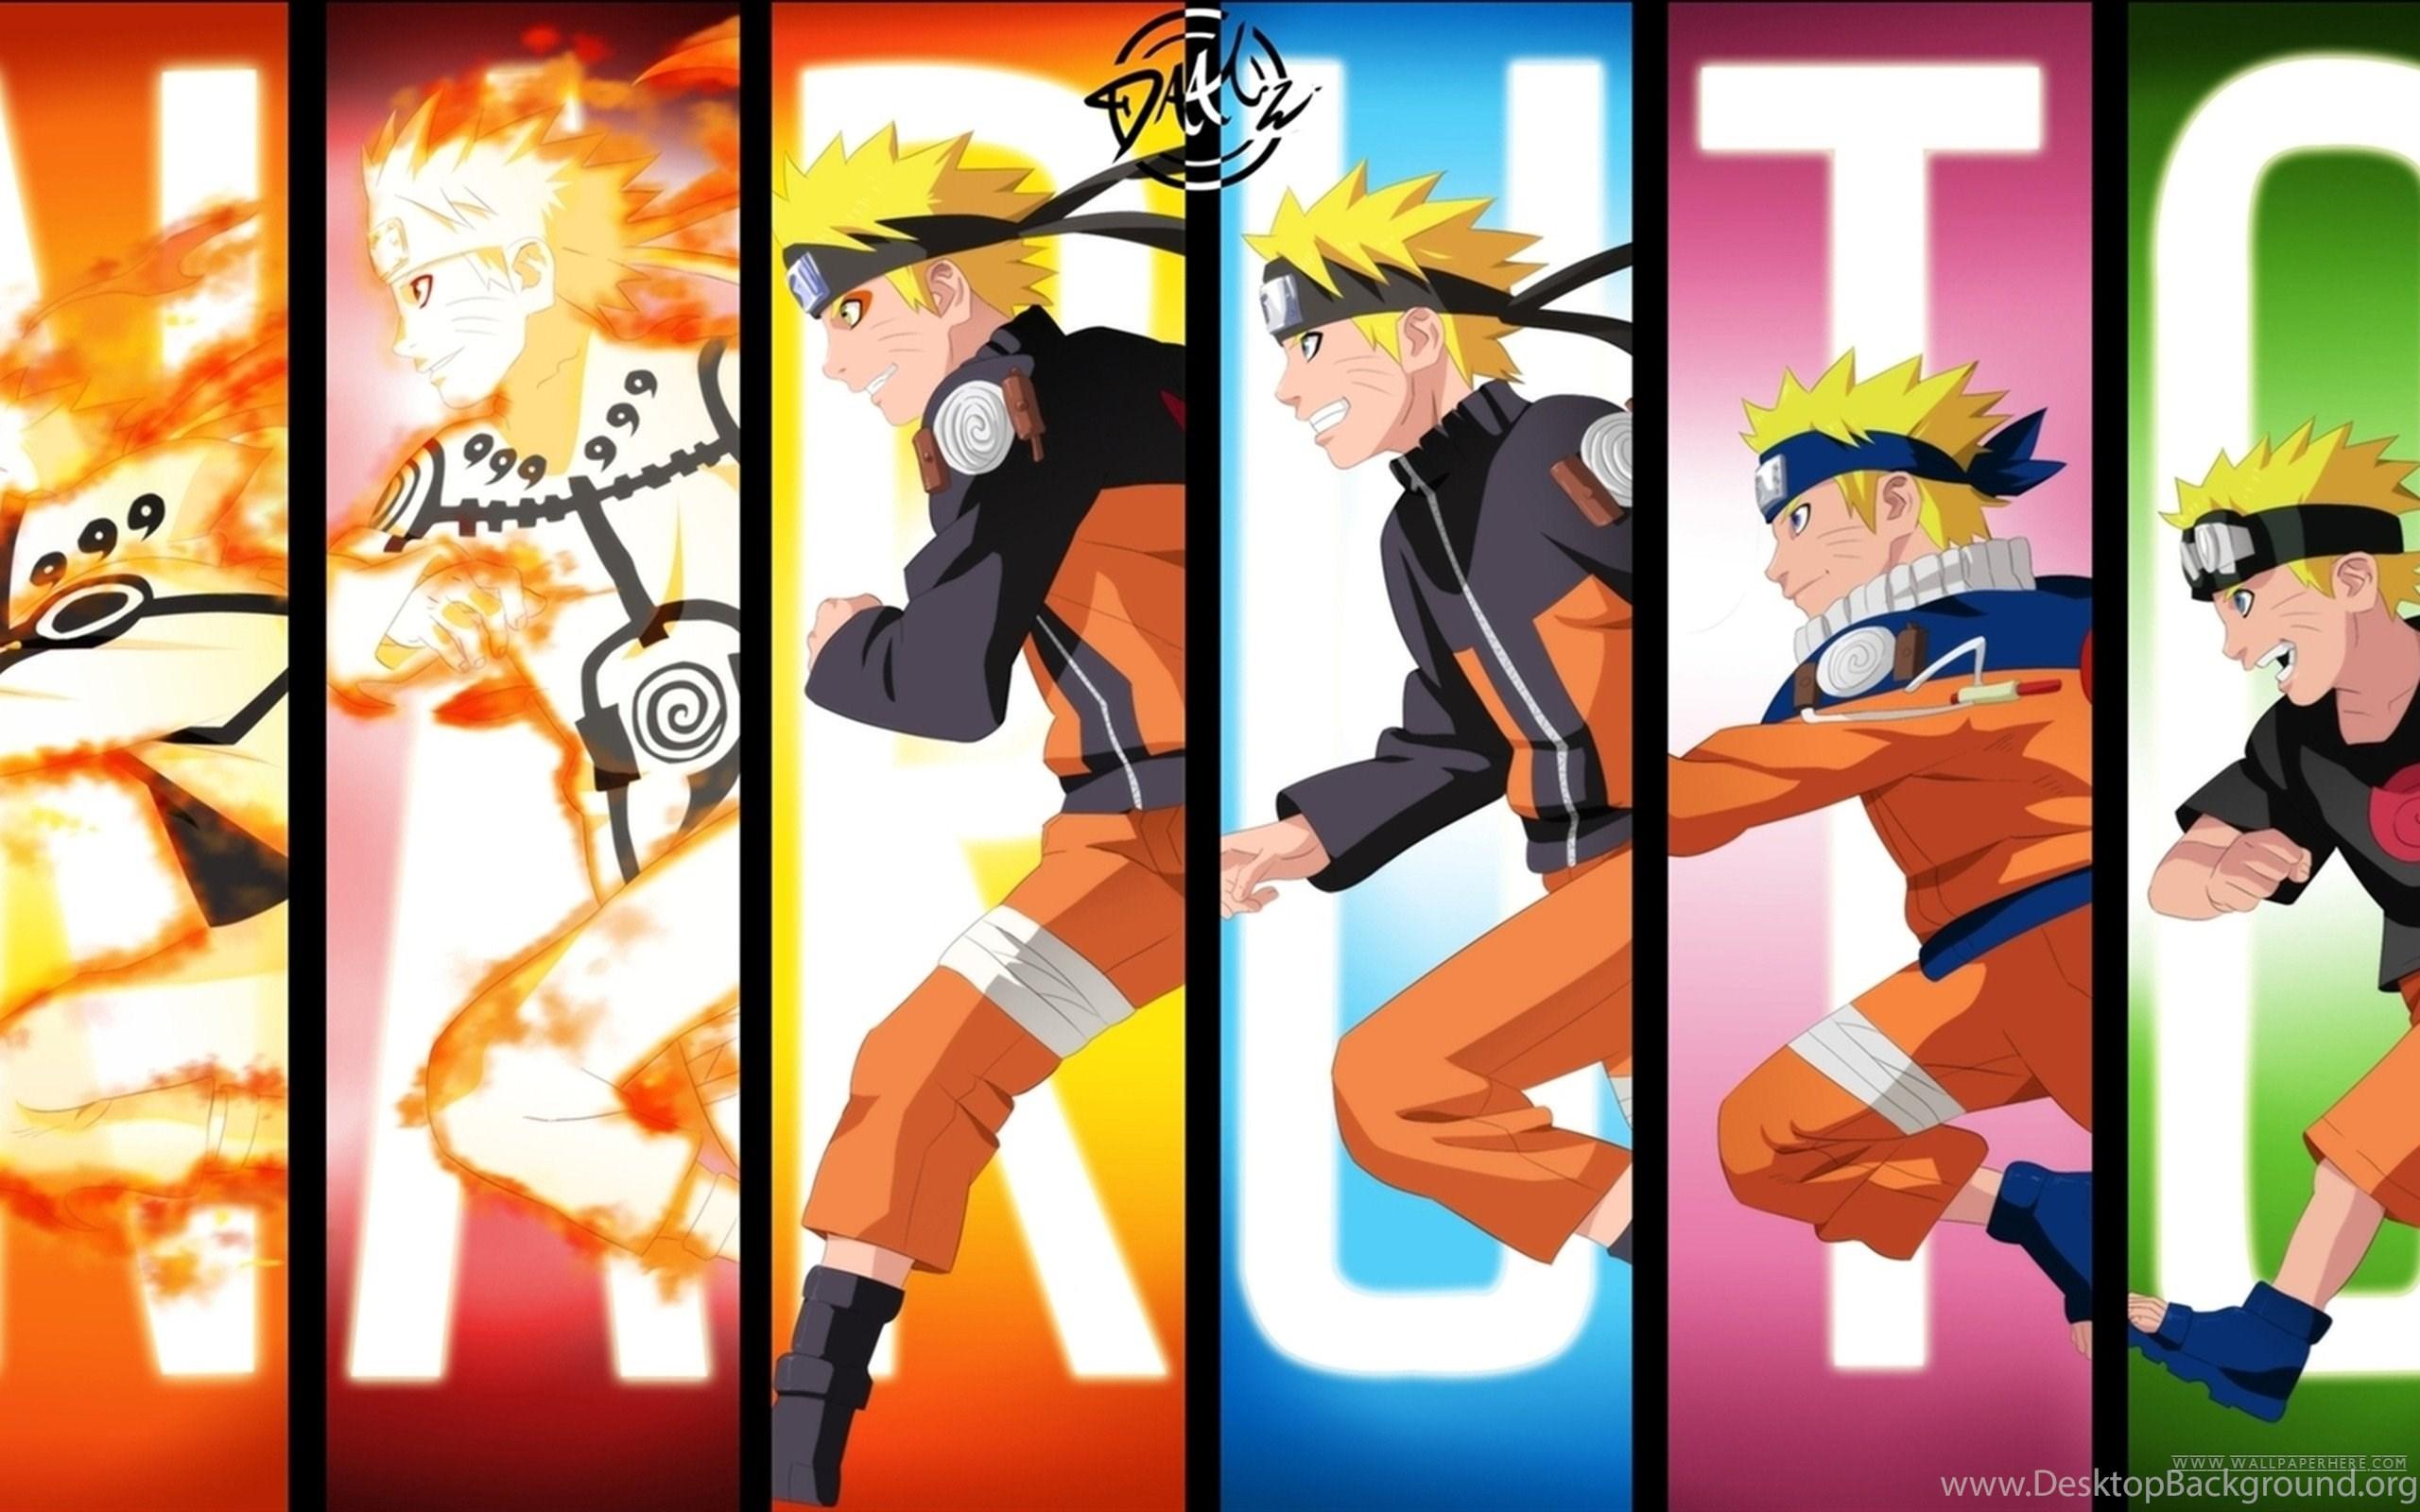 Naruto Wallpaper Backgrounds F3 Hd Wallpapers Desktop Background